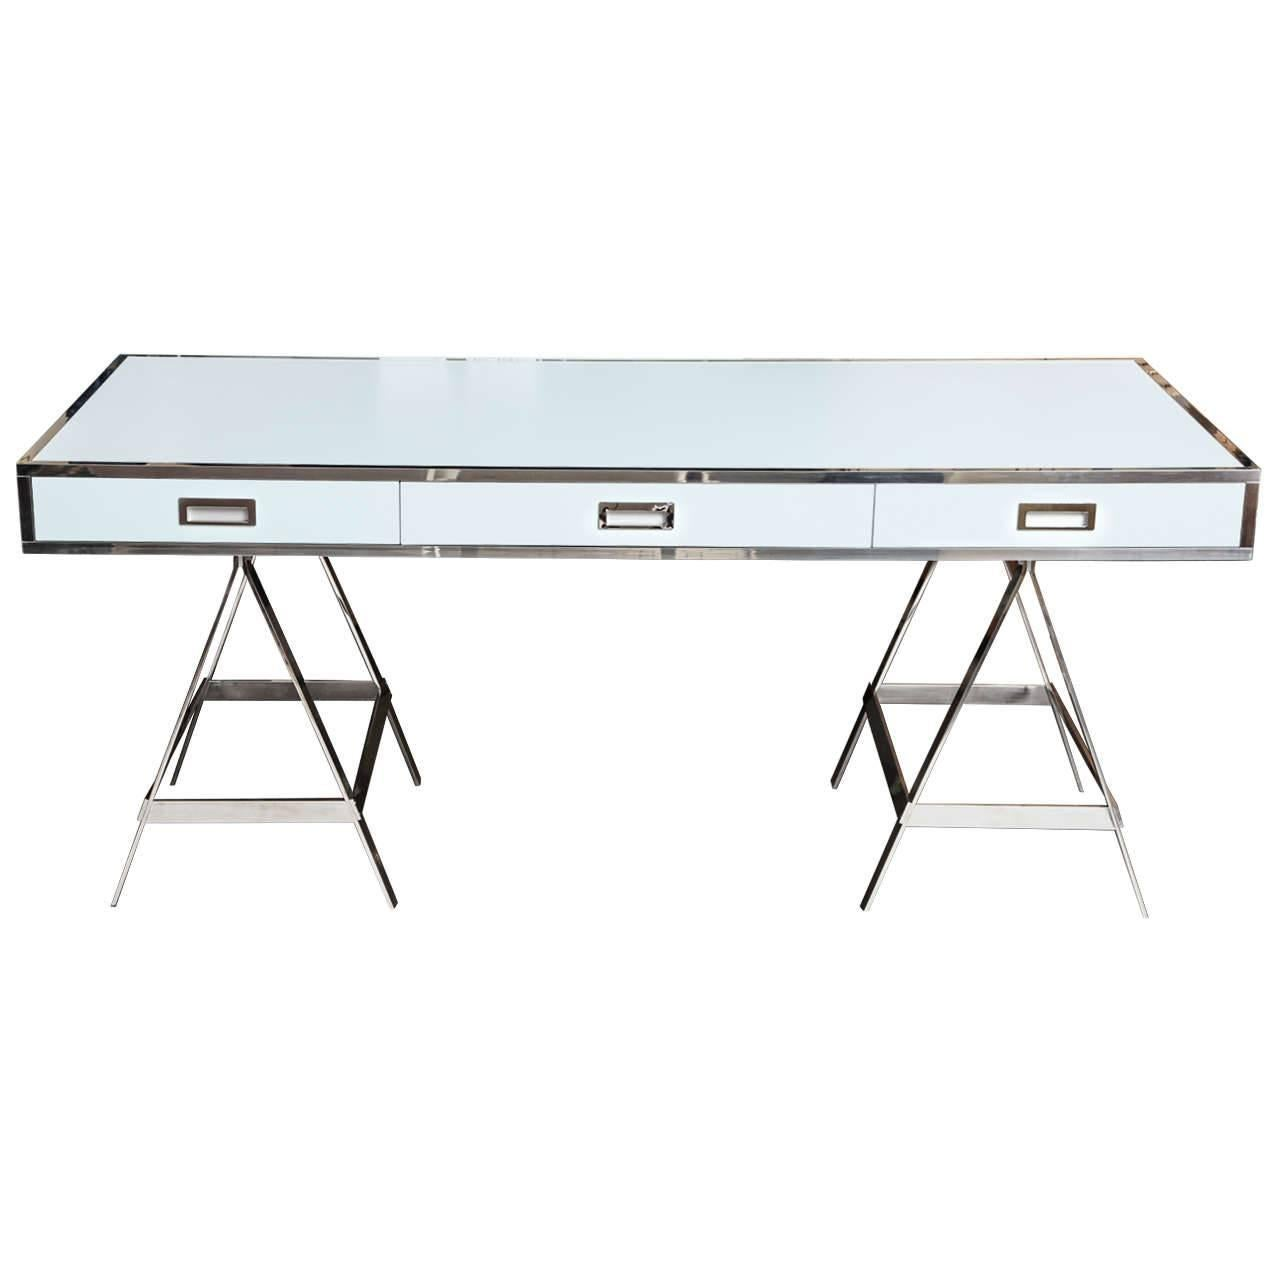 Albrizzi Trestle Desk New Larger Size